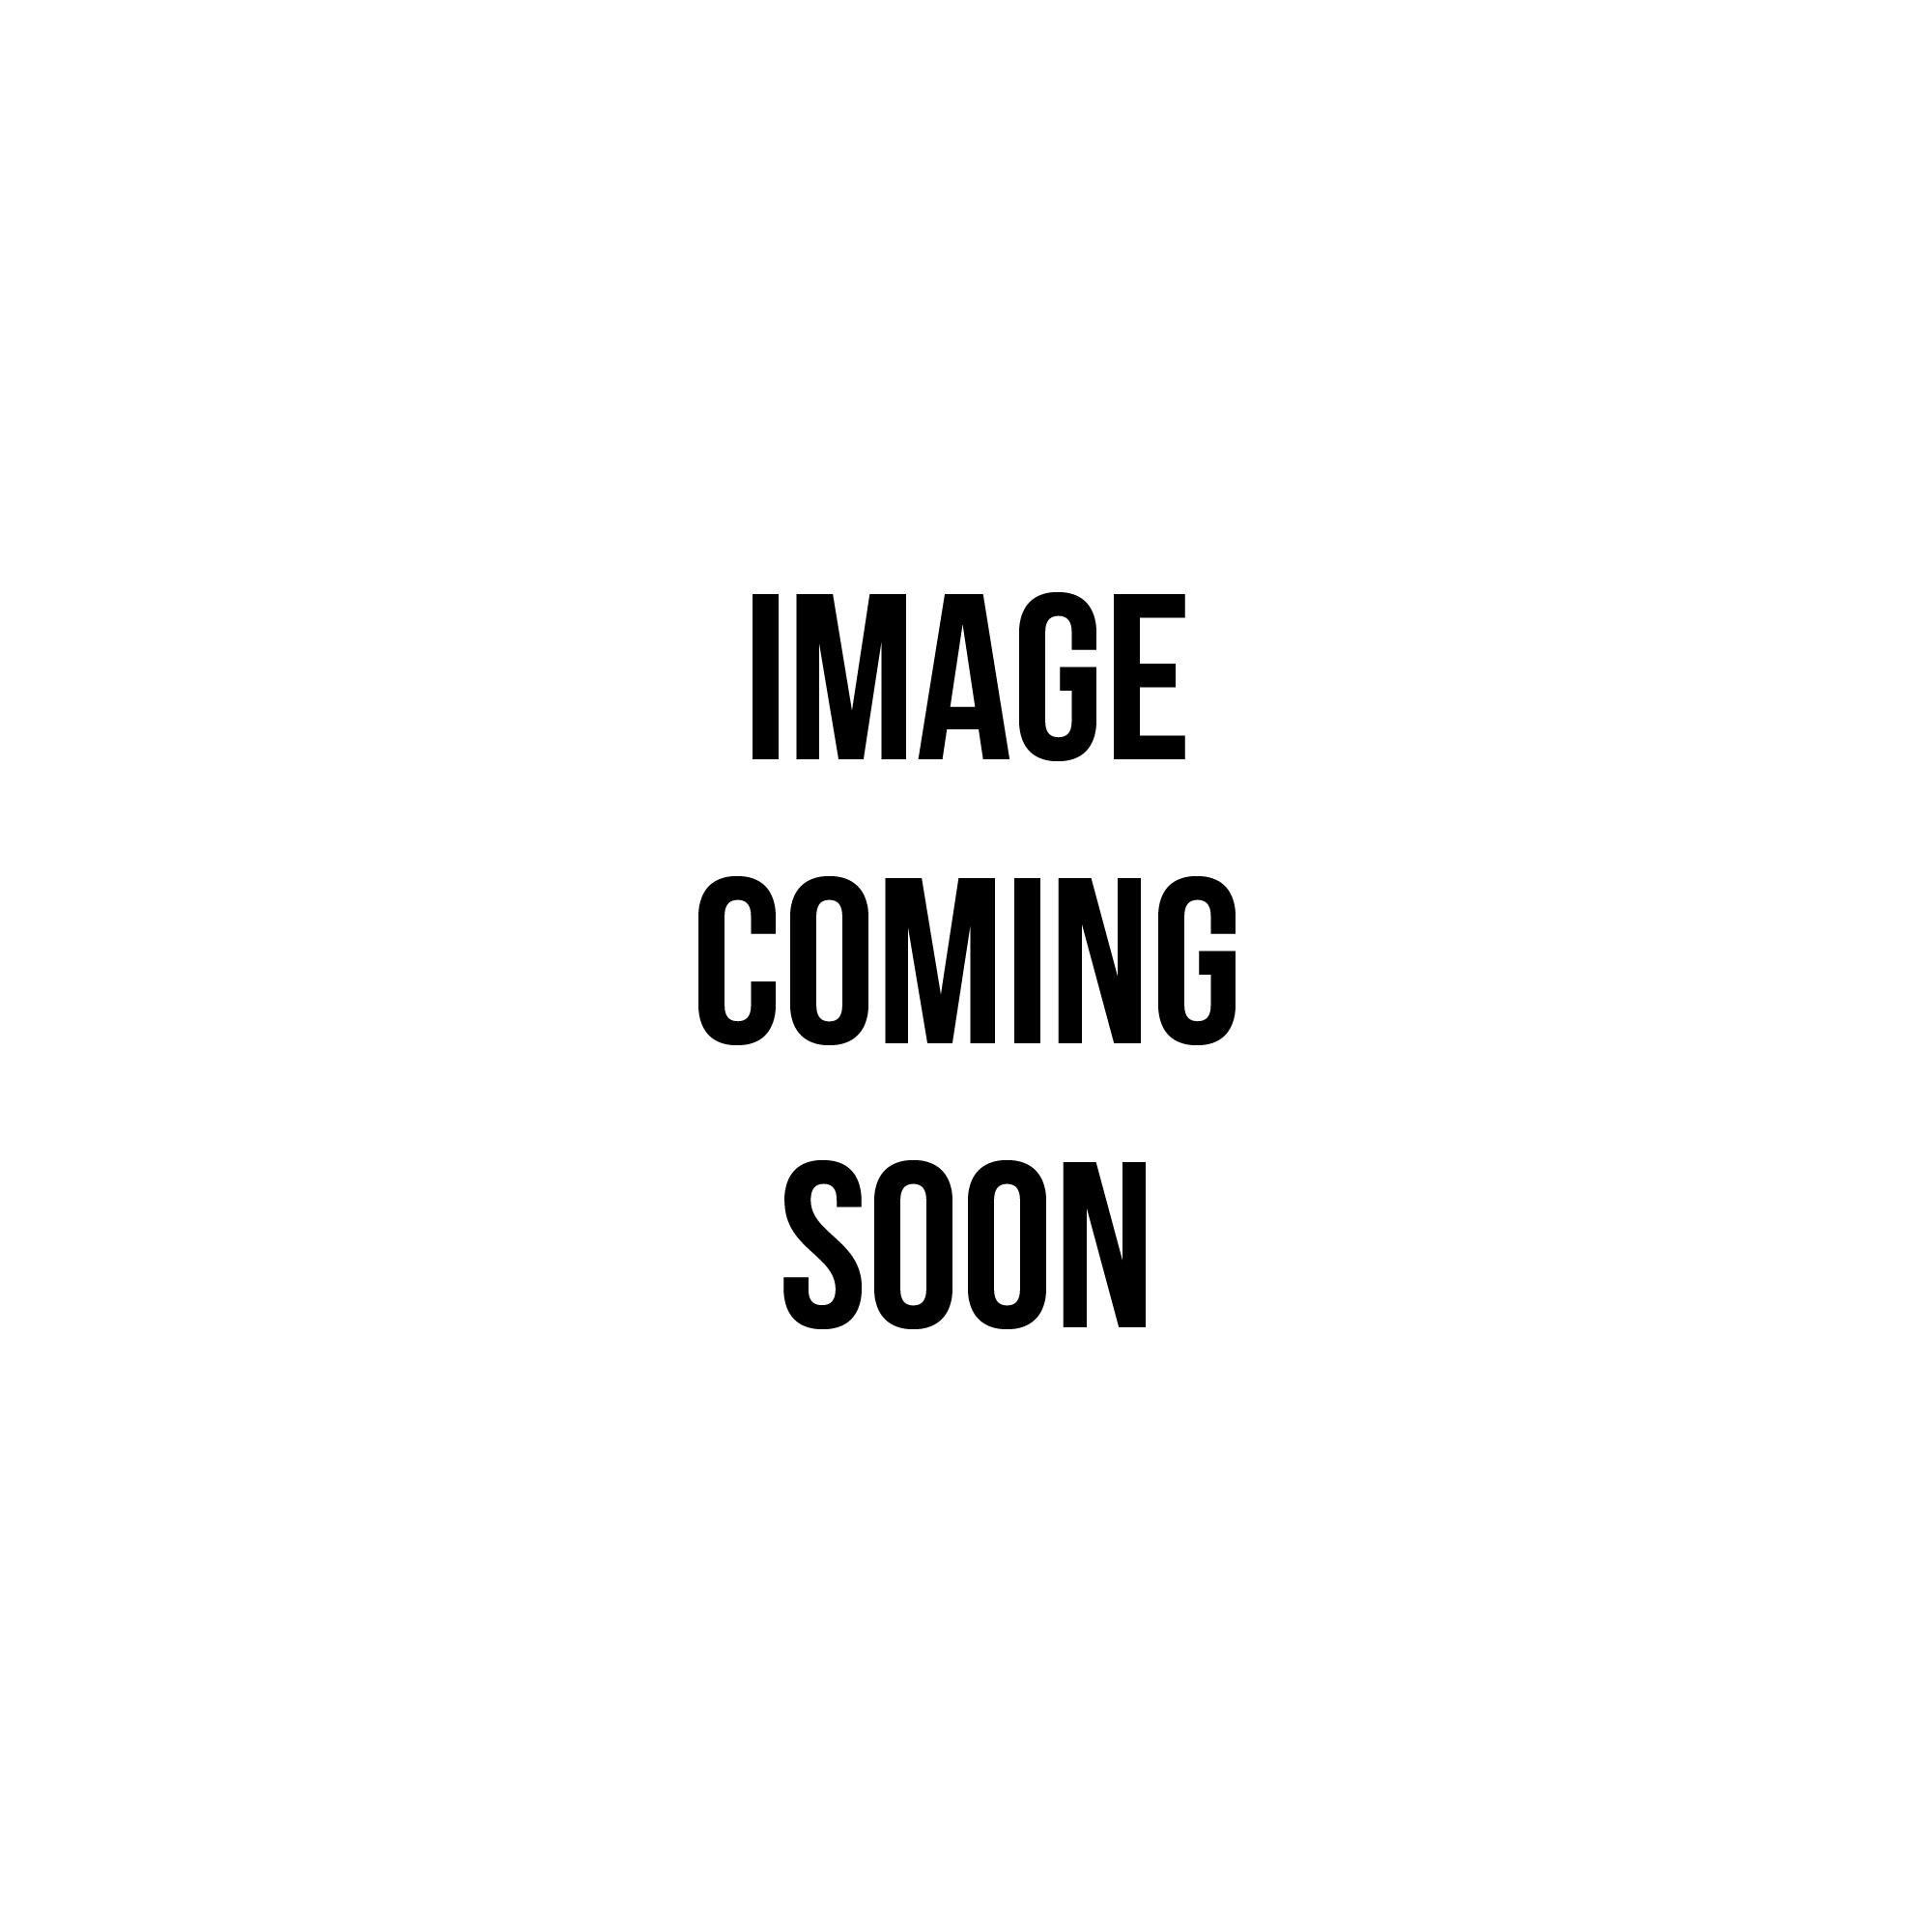 ded4f15847796 Nike Barkley Posite Max 76 Size 7